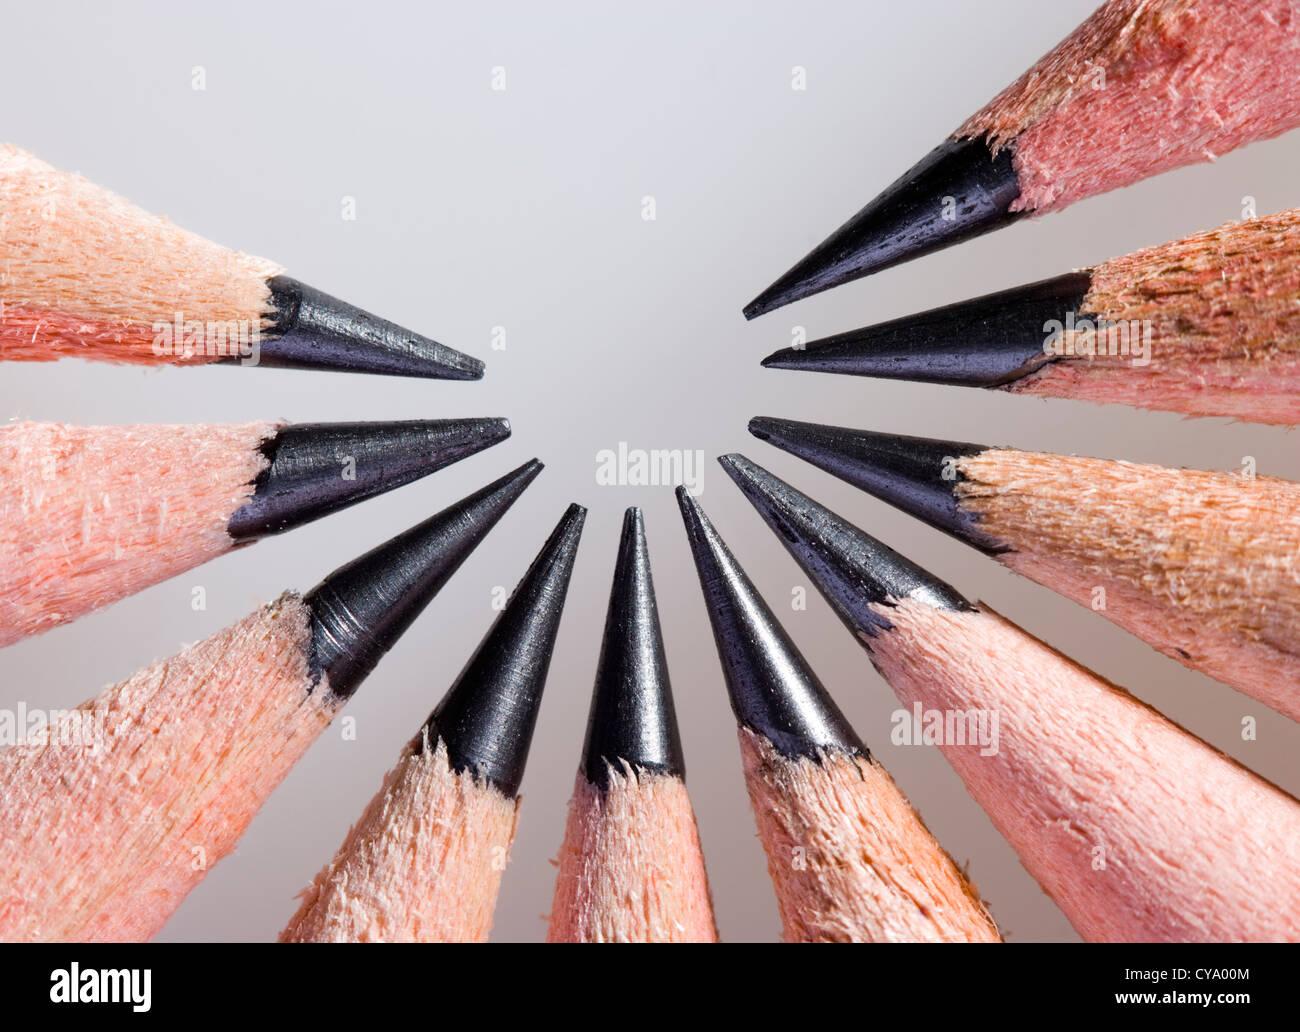 Pencils. - Stock Image